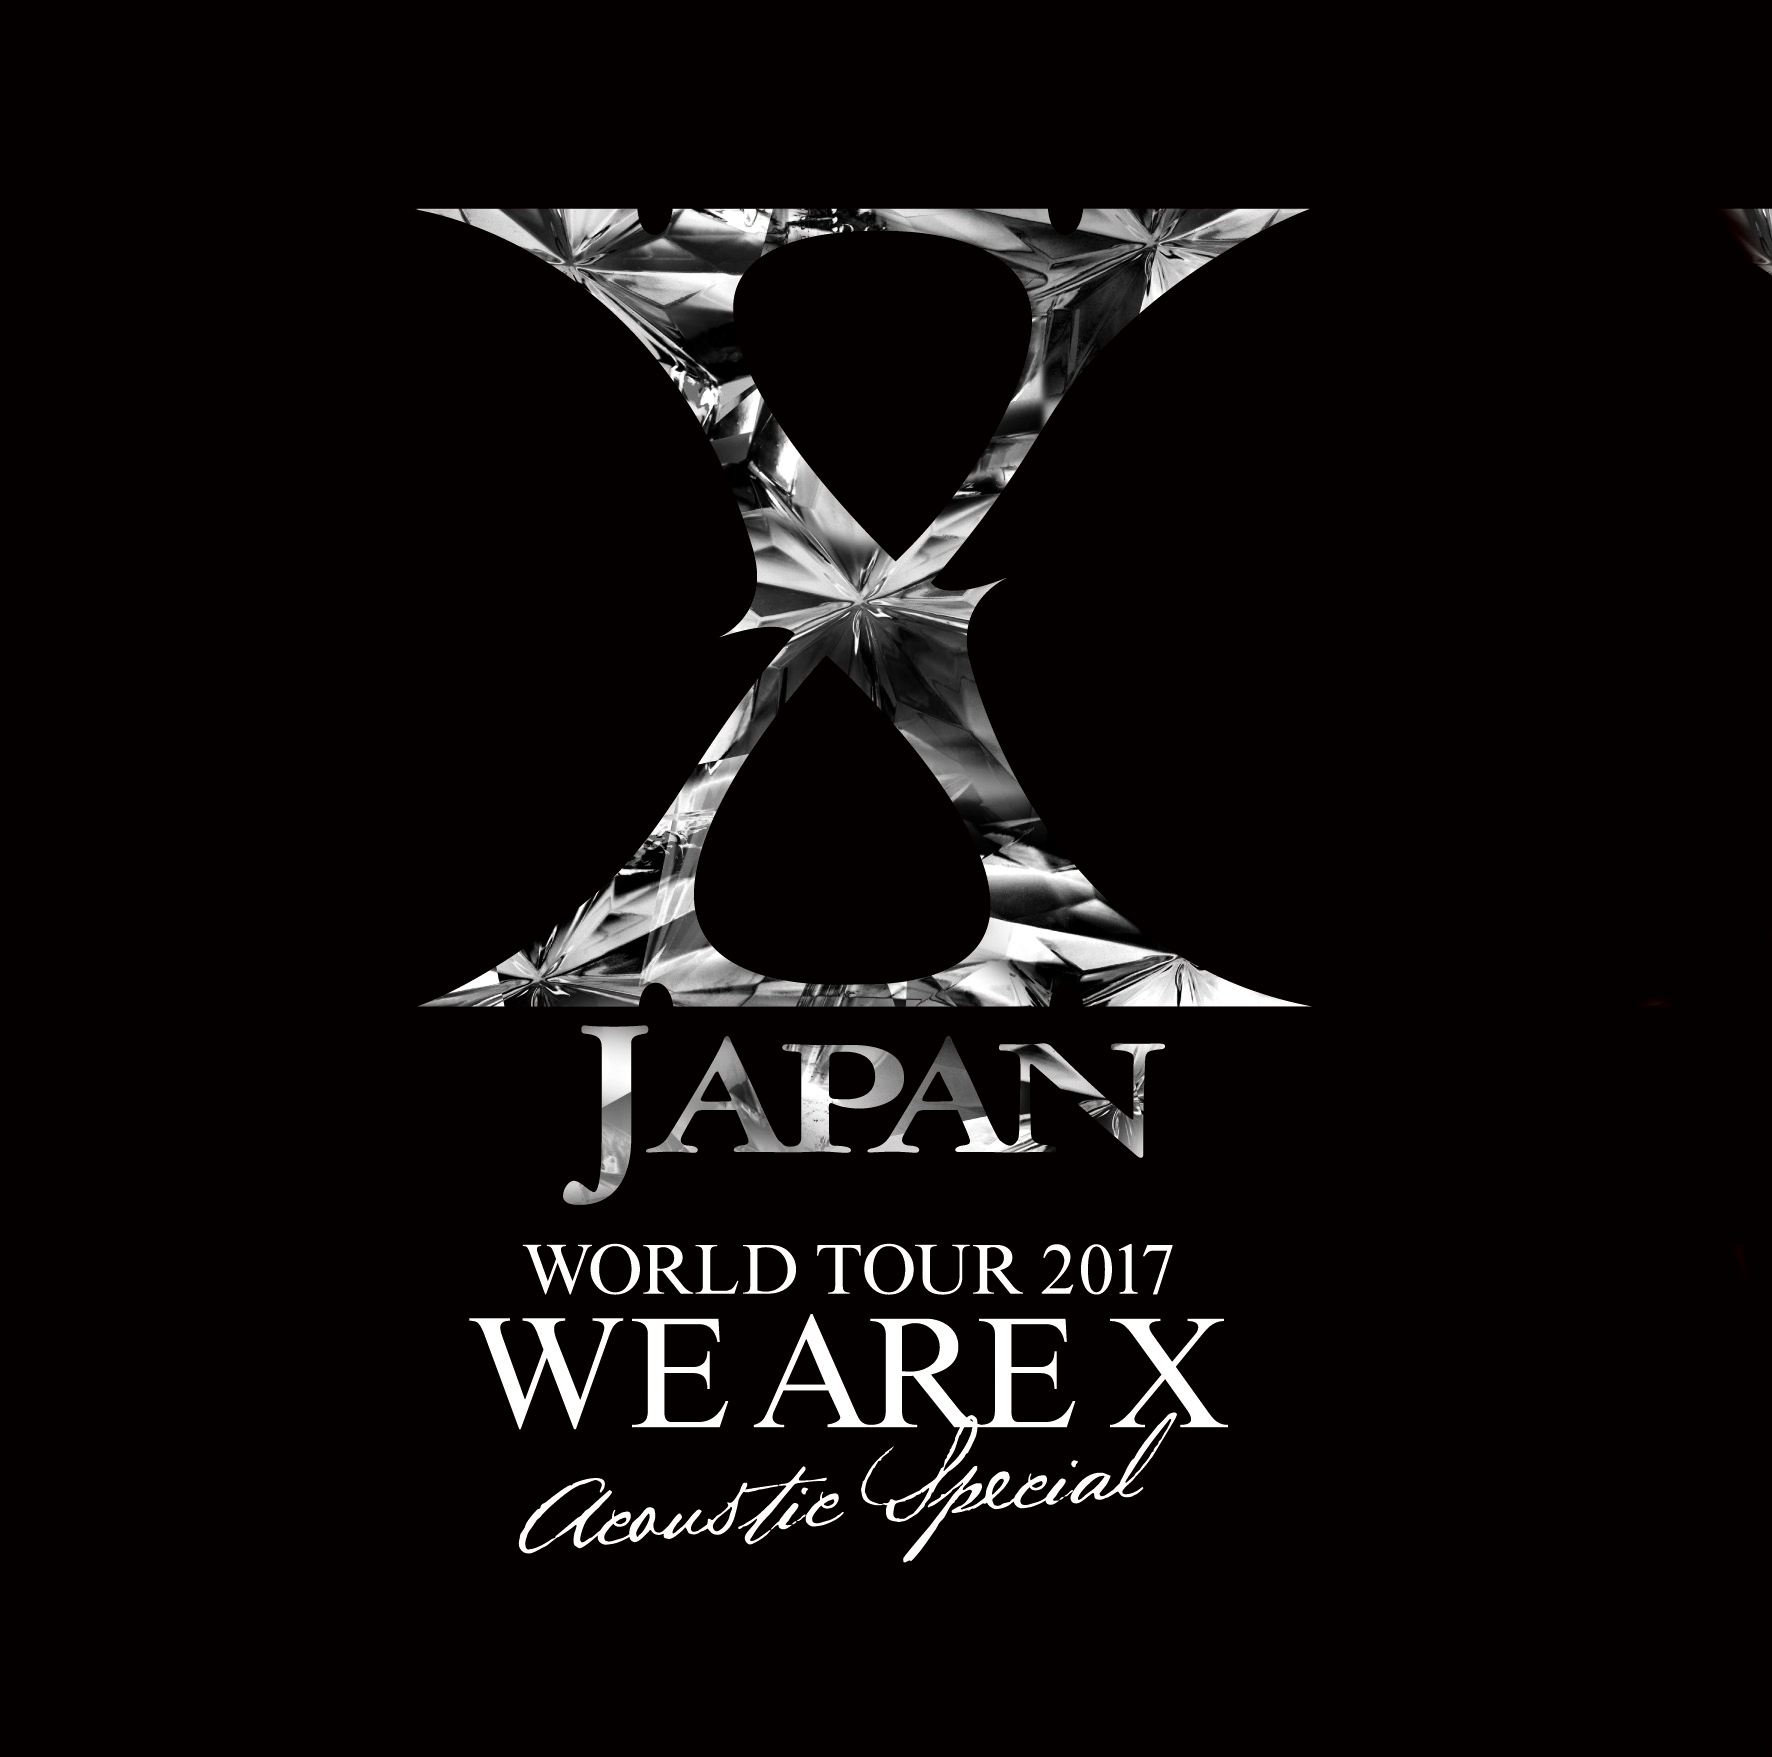 X JAPANツアーロゴ